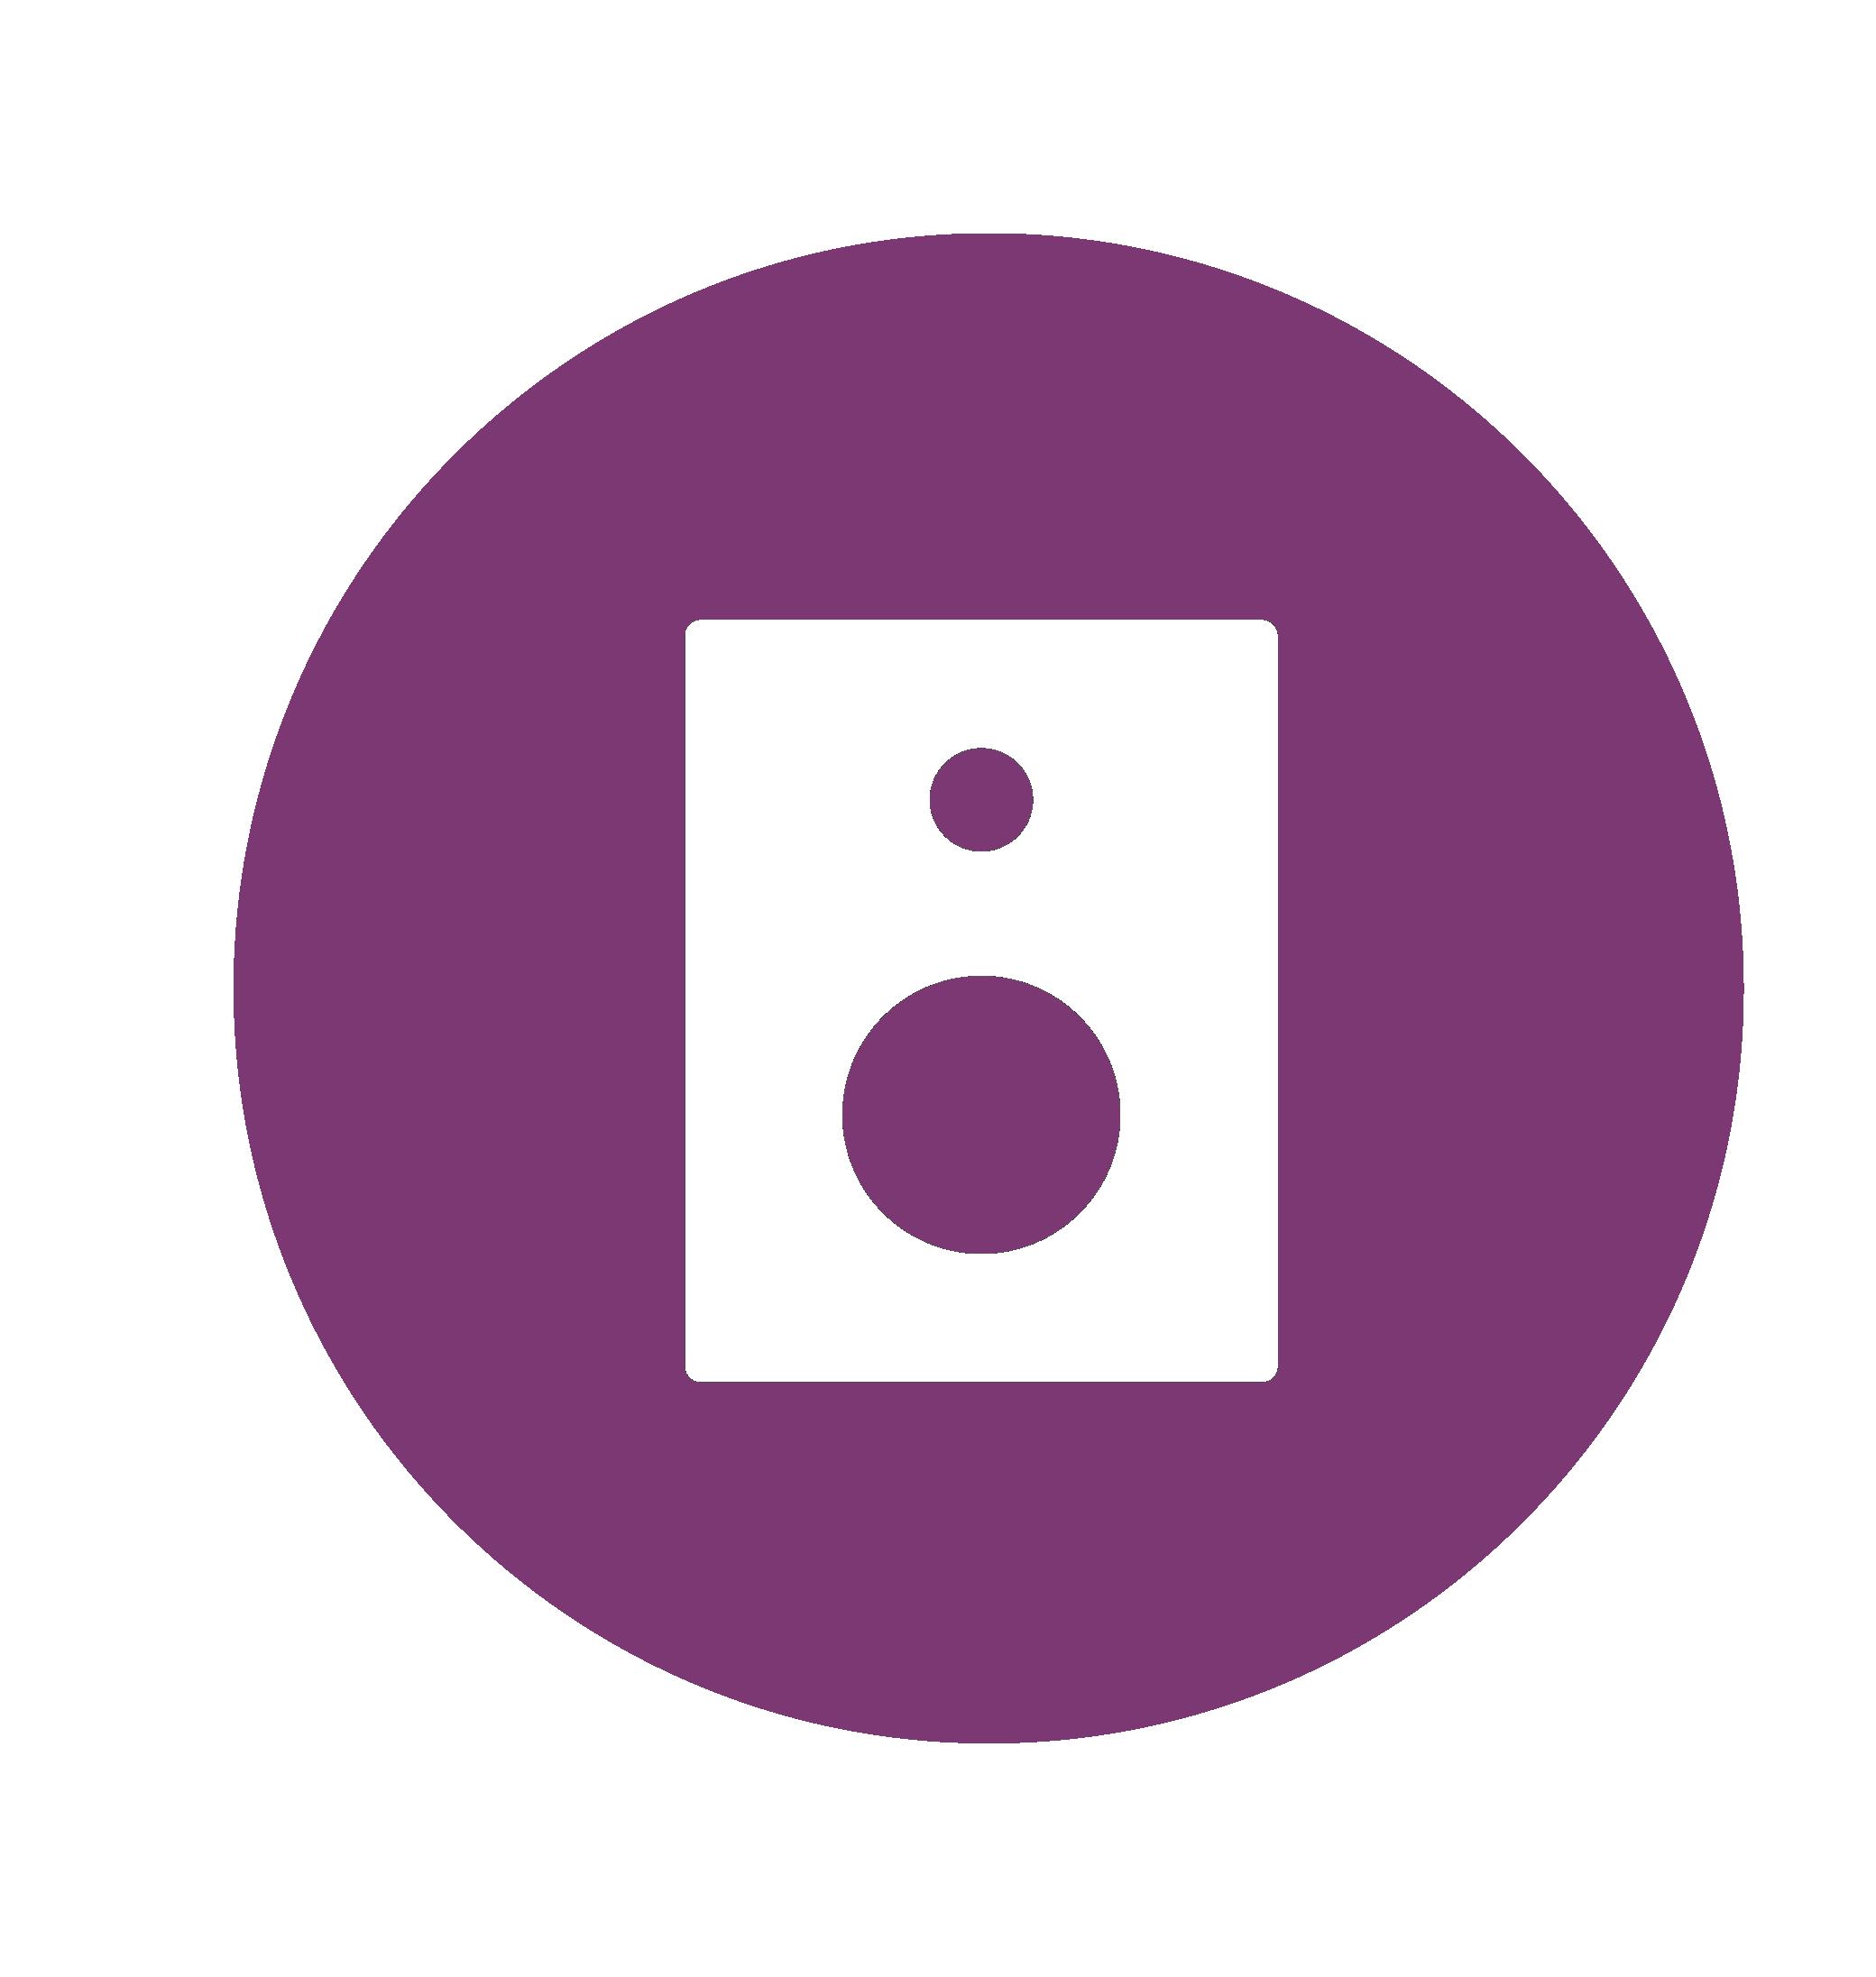 LG Logo Scratch-07.png